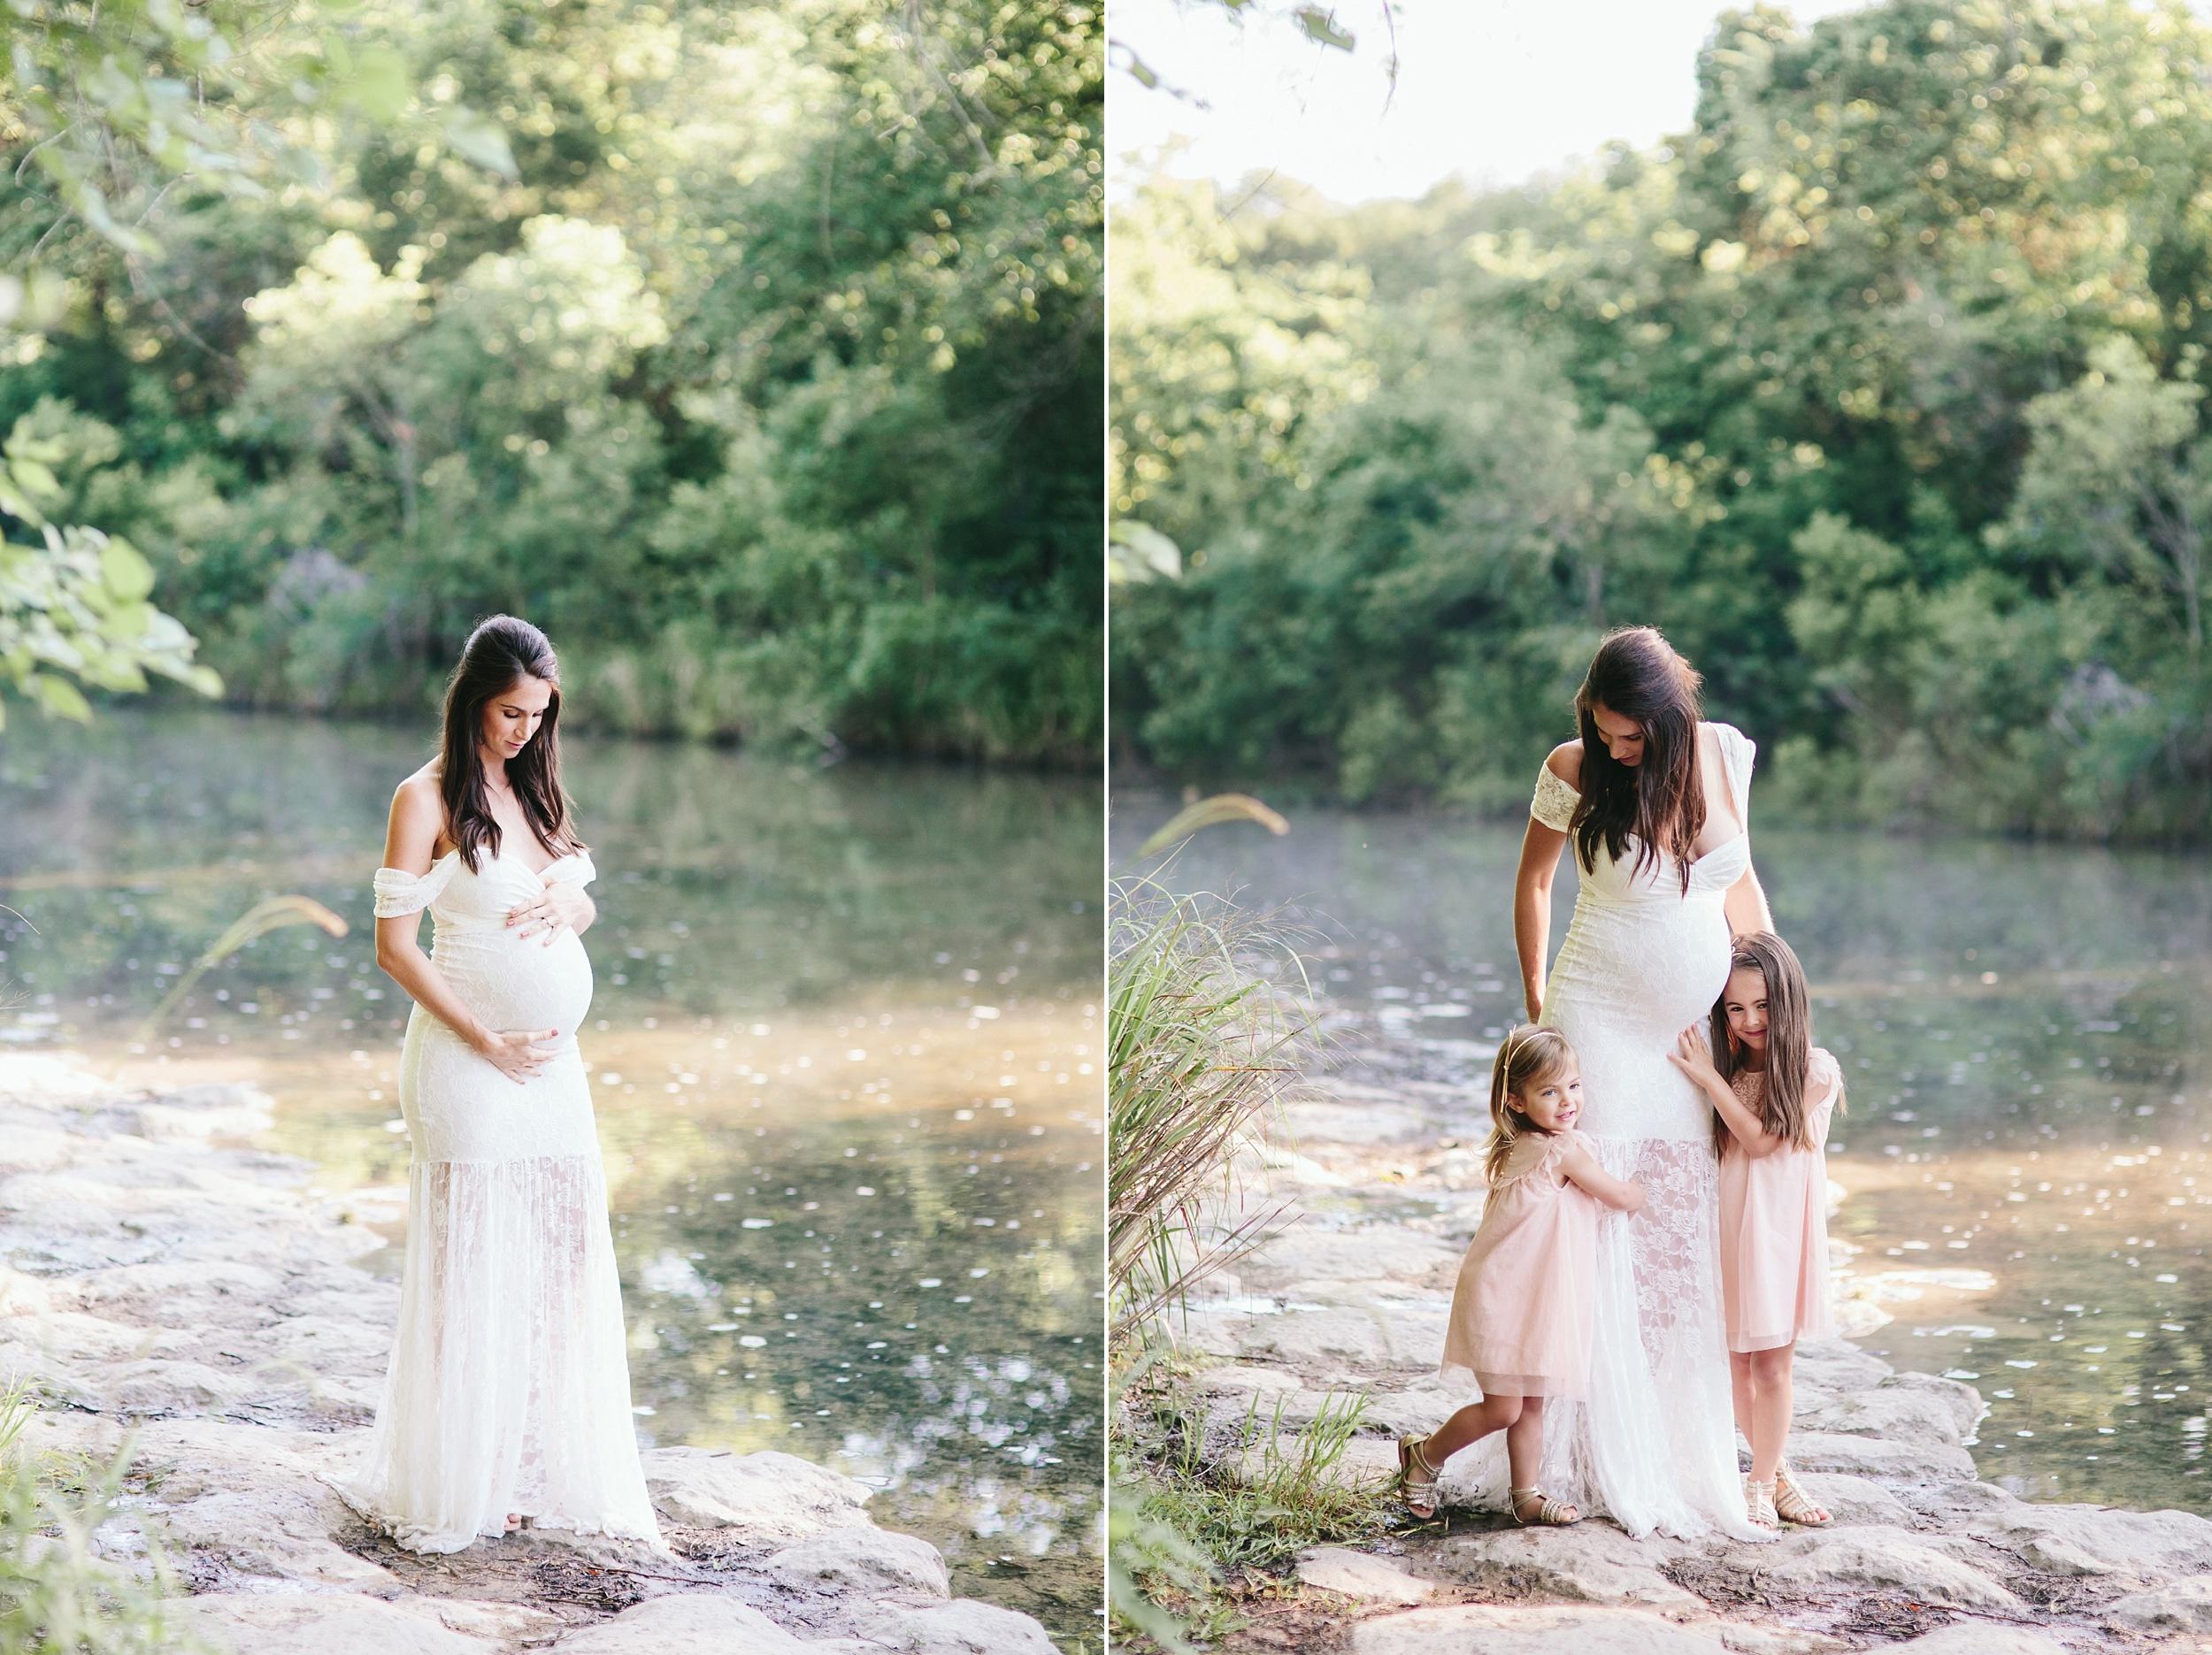 Austin TX Maternity Photographer 05.jpg